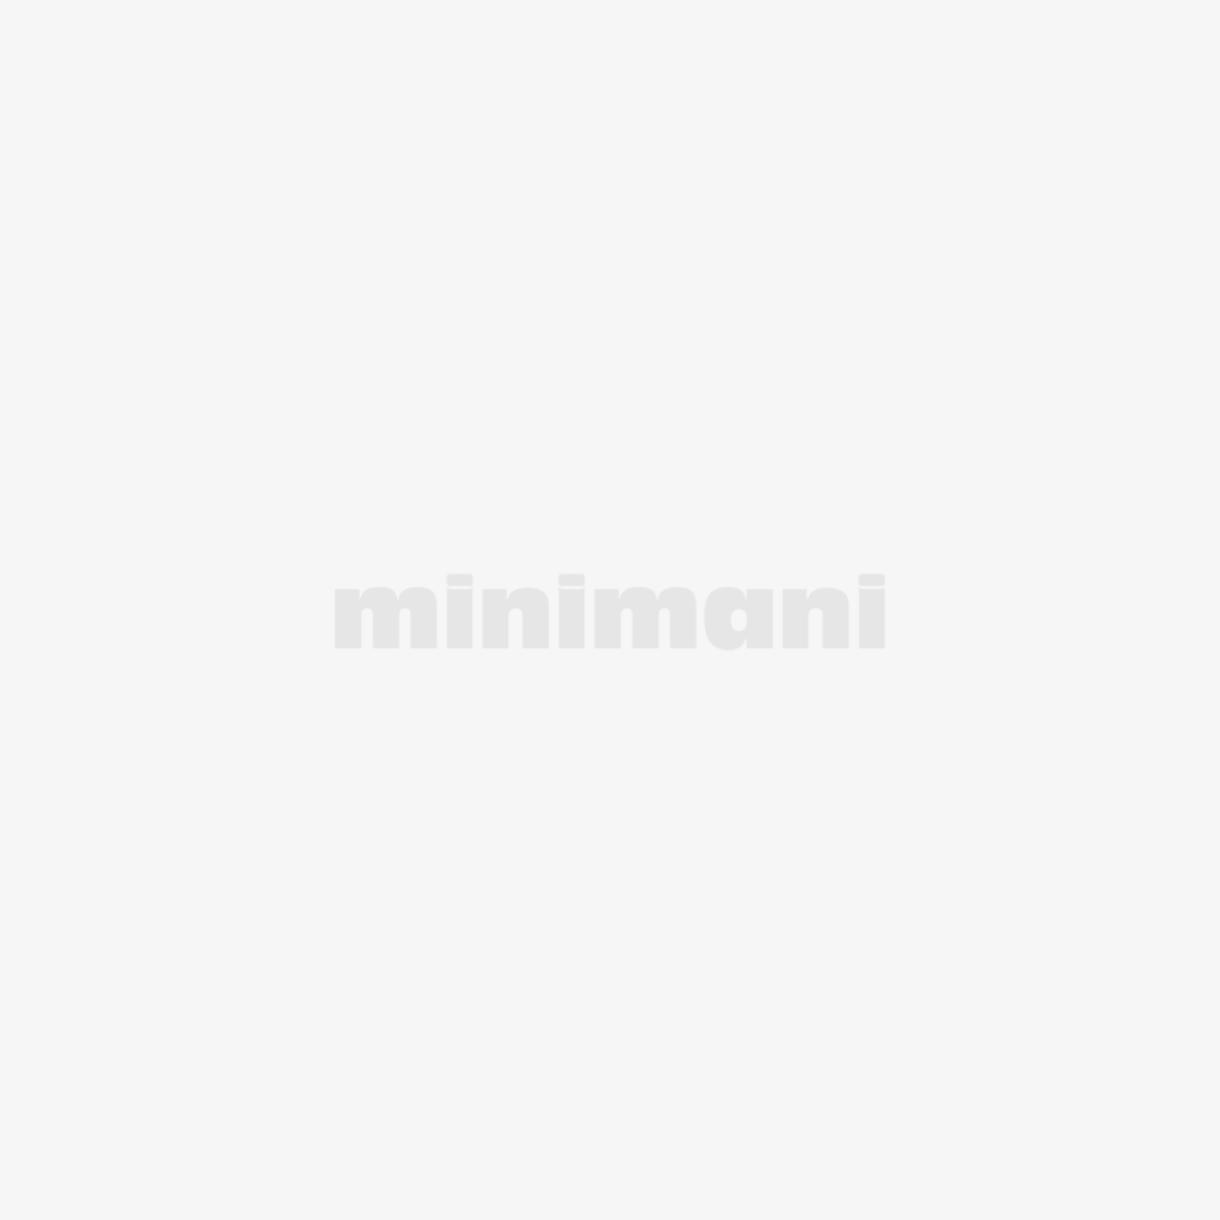 M-FILTER ILMANSUODATIN  MA 6875  VW TRANSPORTER 91-